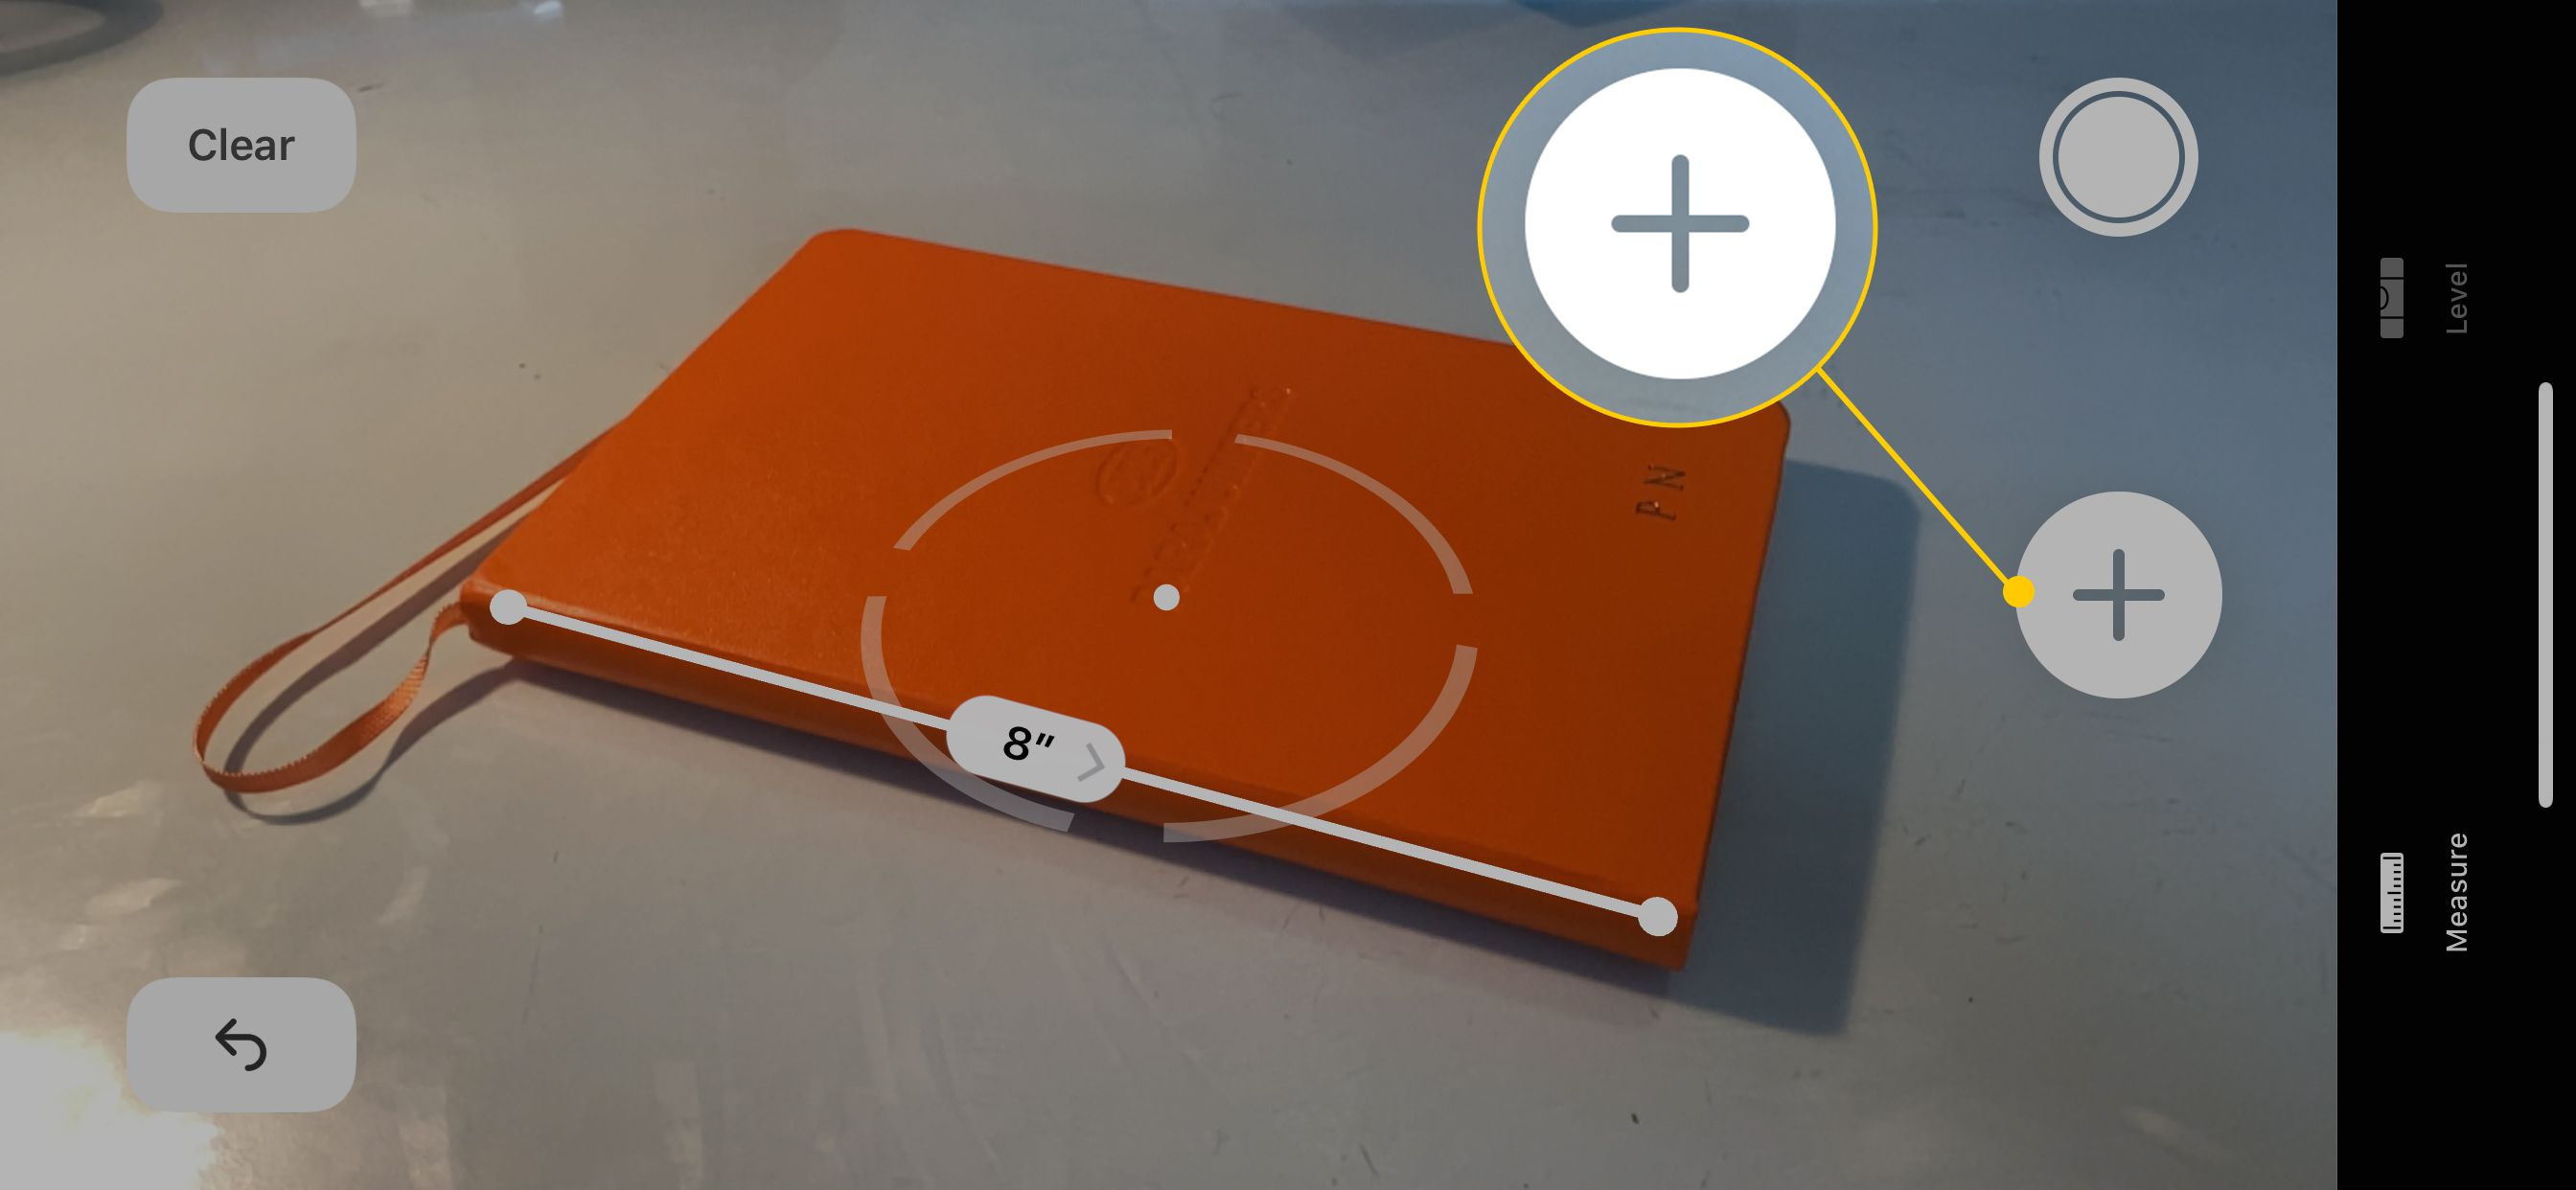 Plus button in the Measure App